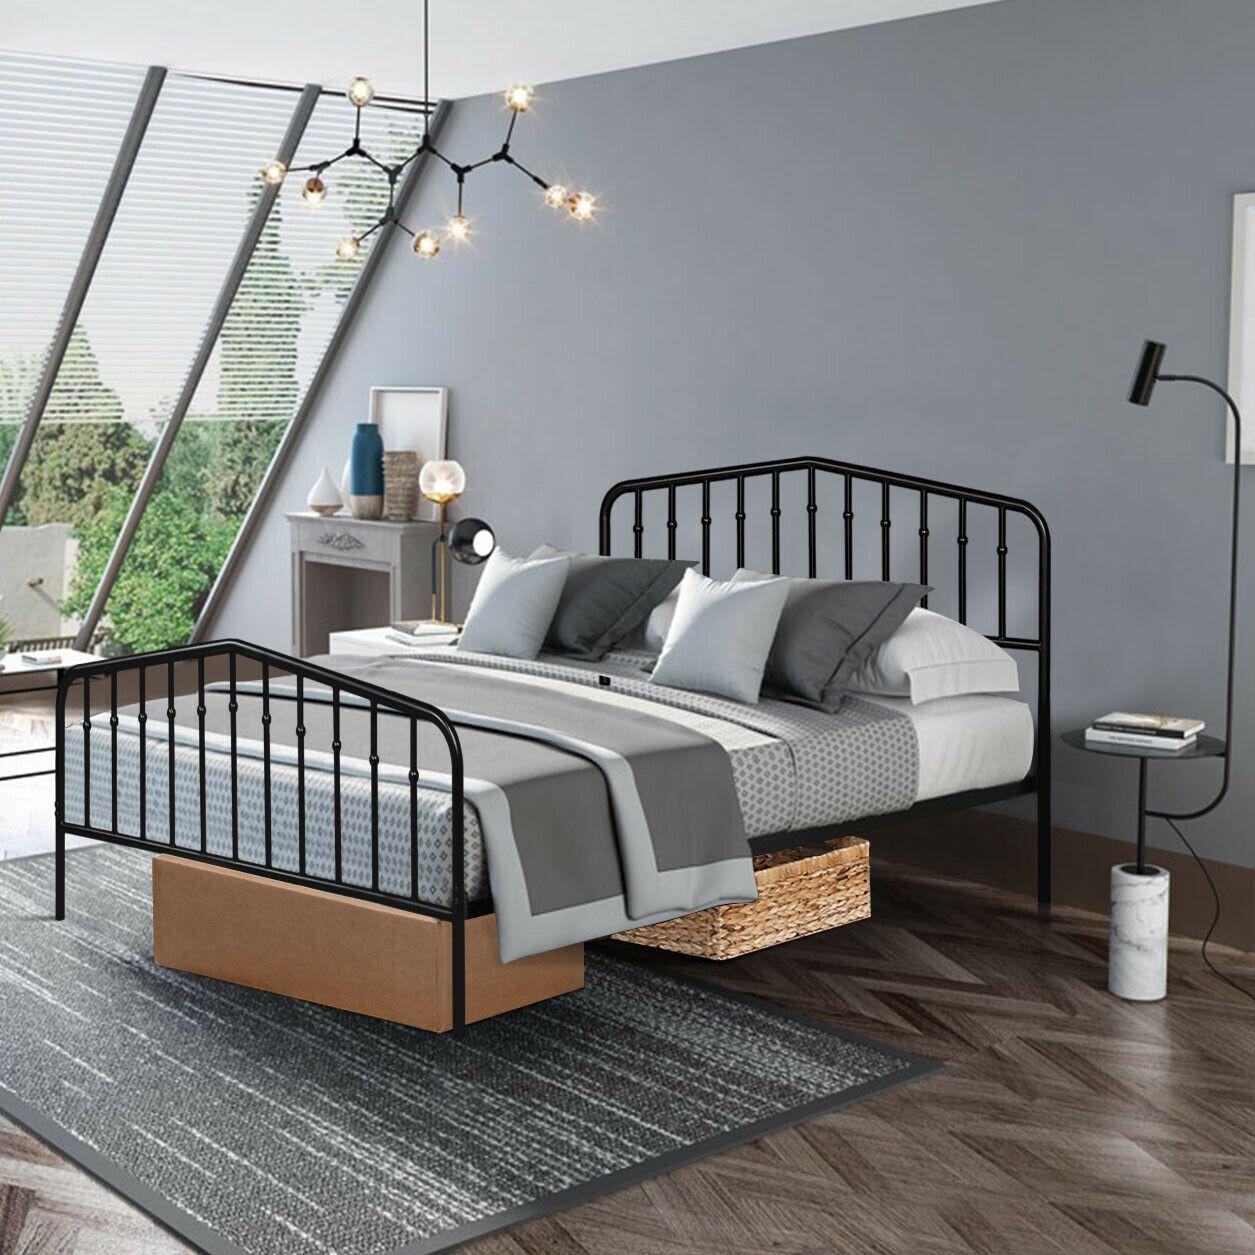 Queen Size Metal Bed Frame Steel Slat Platform in 2020